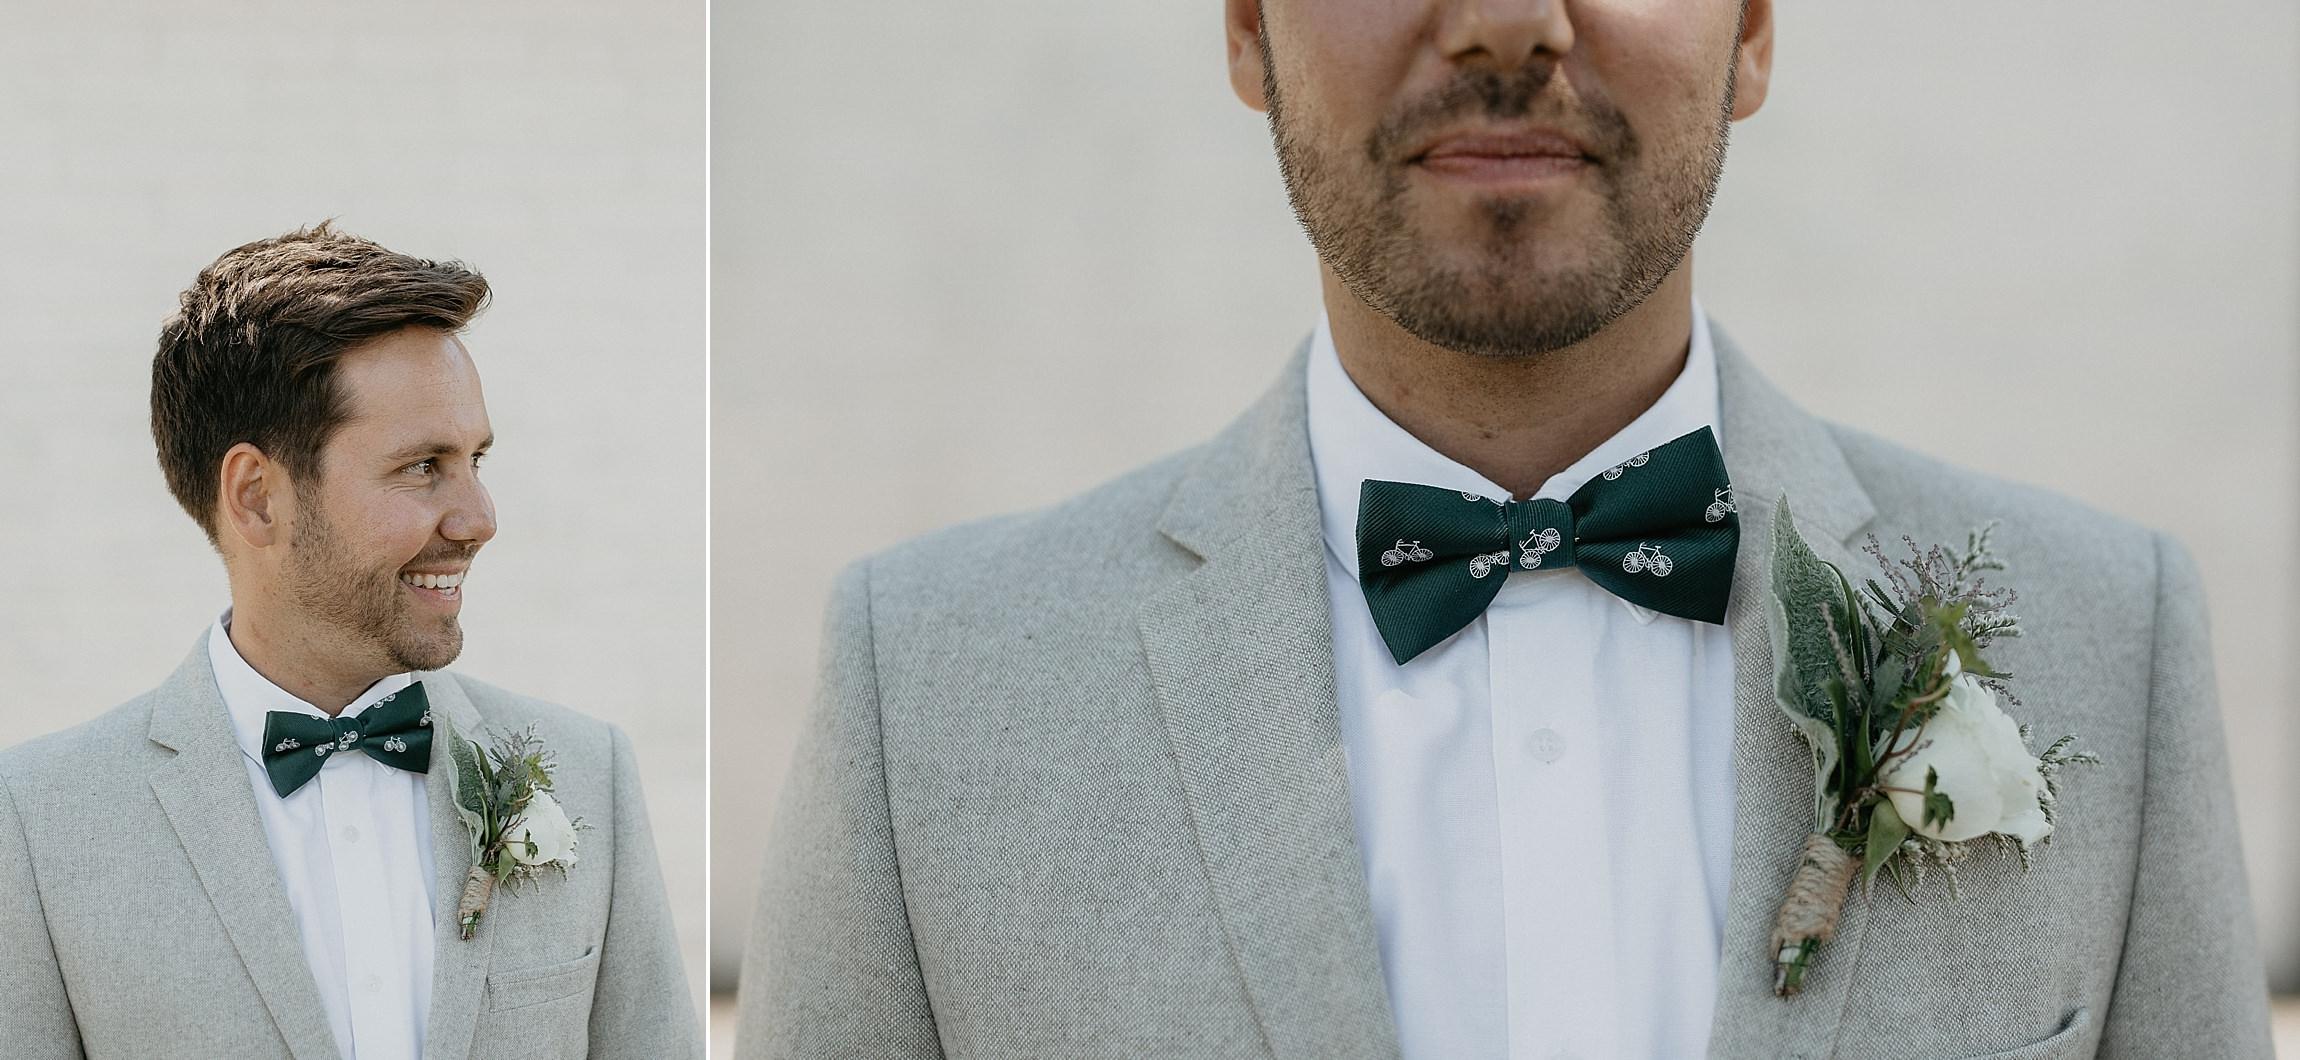 oldforestschool-wedding-blog-39.jpg